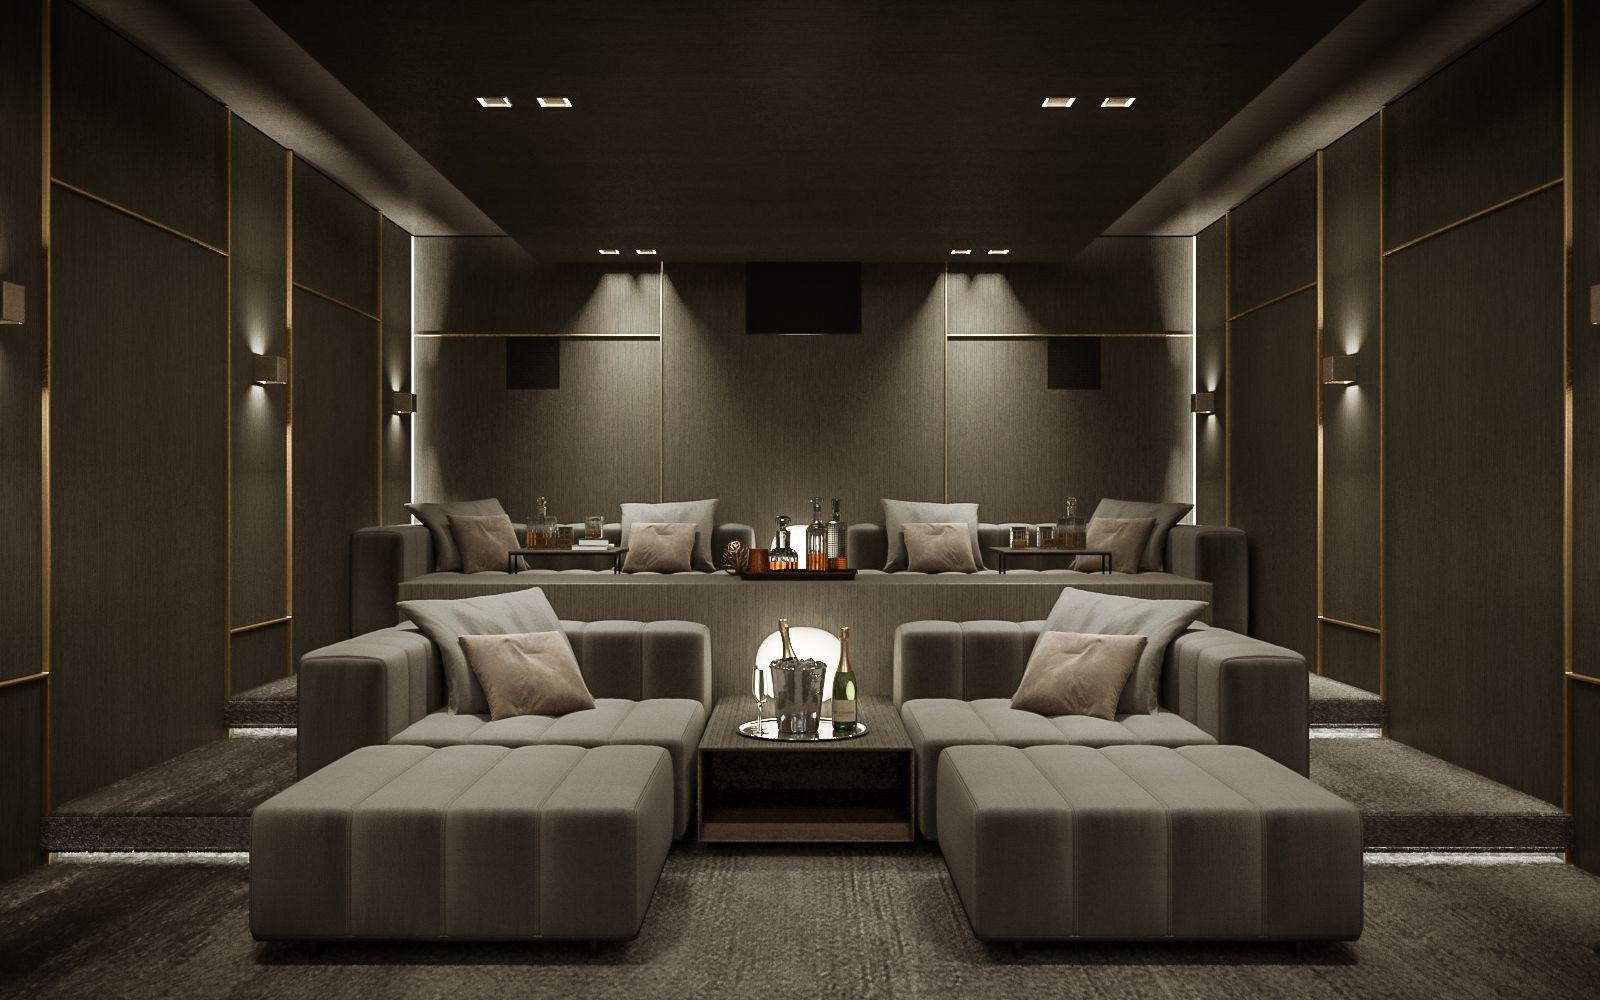 Private Home Theater 1134